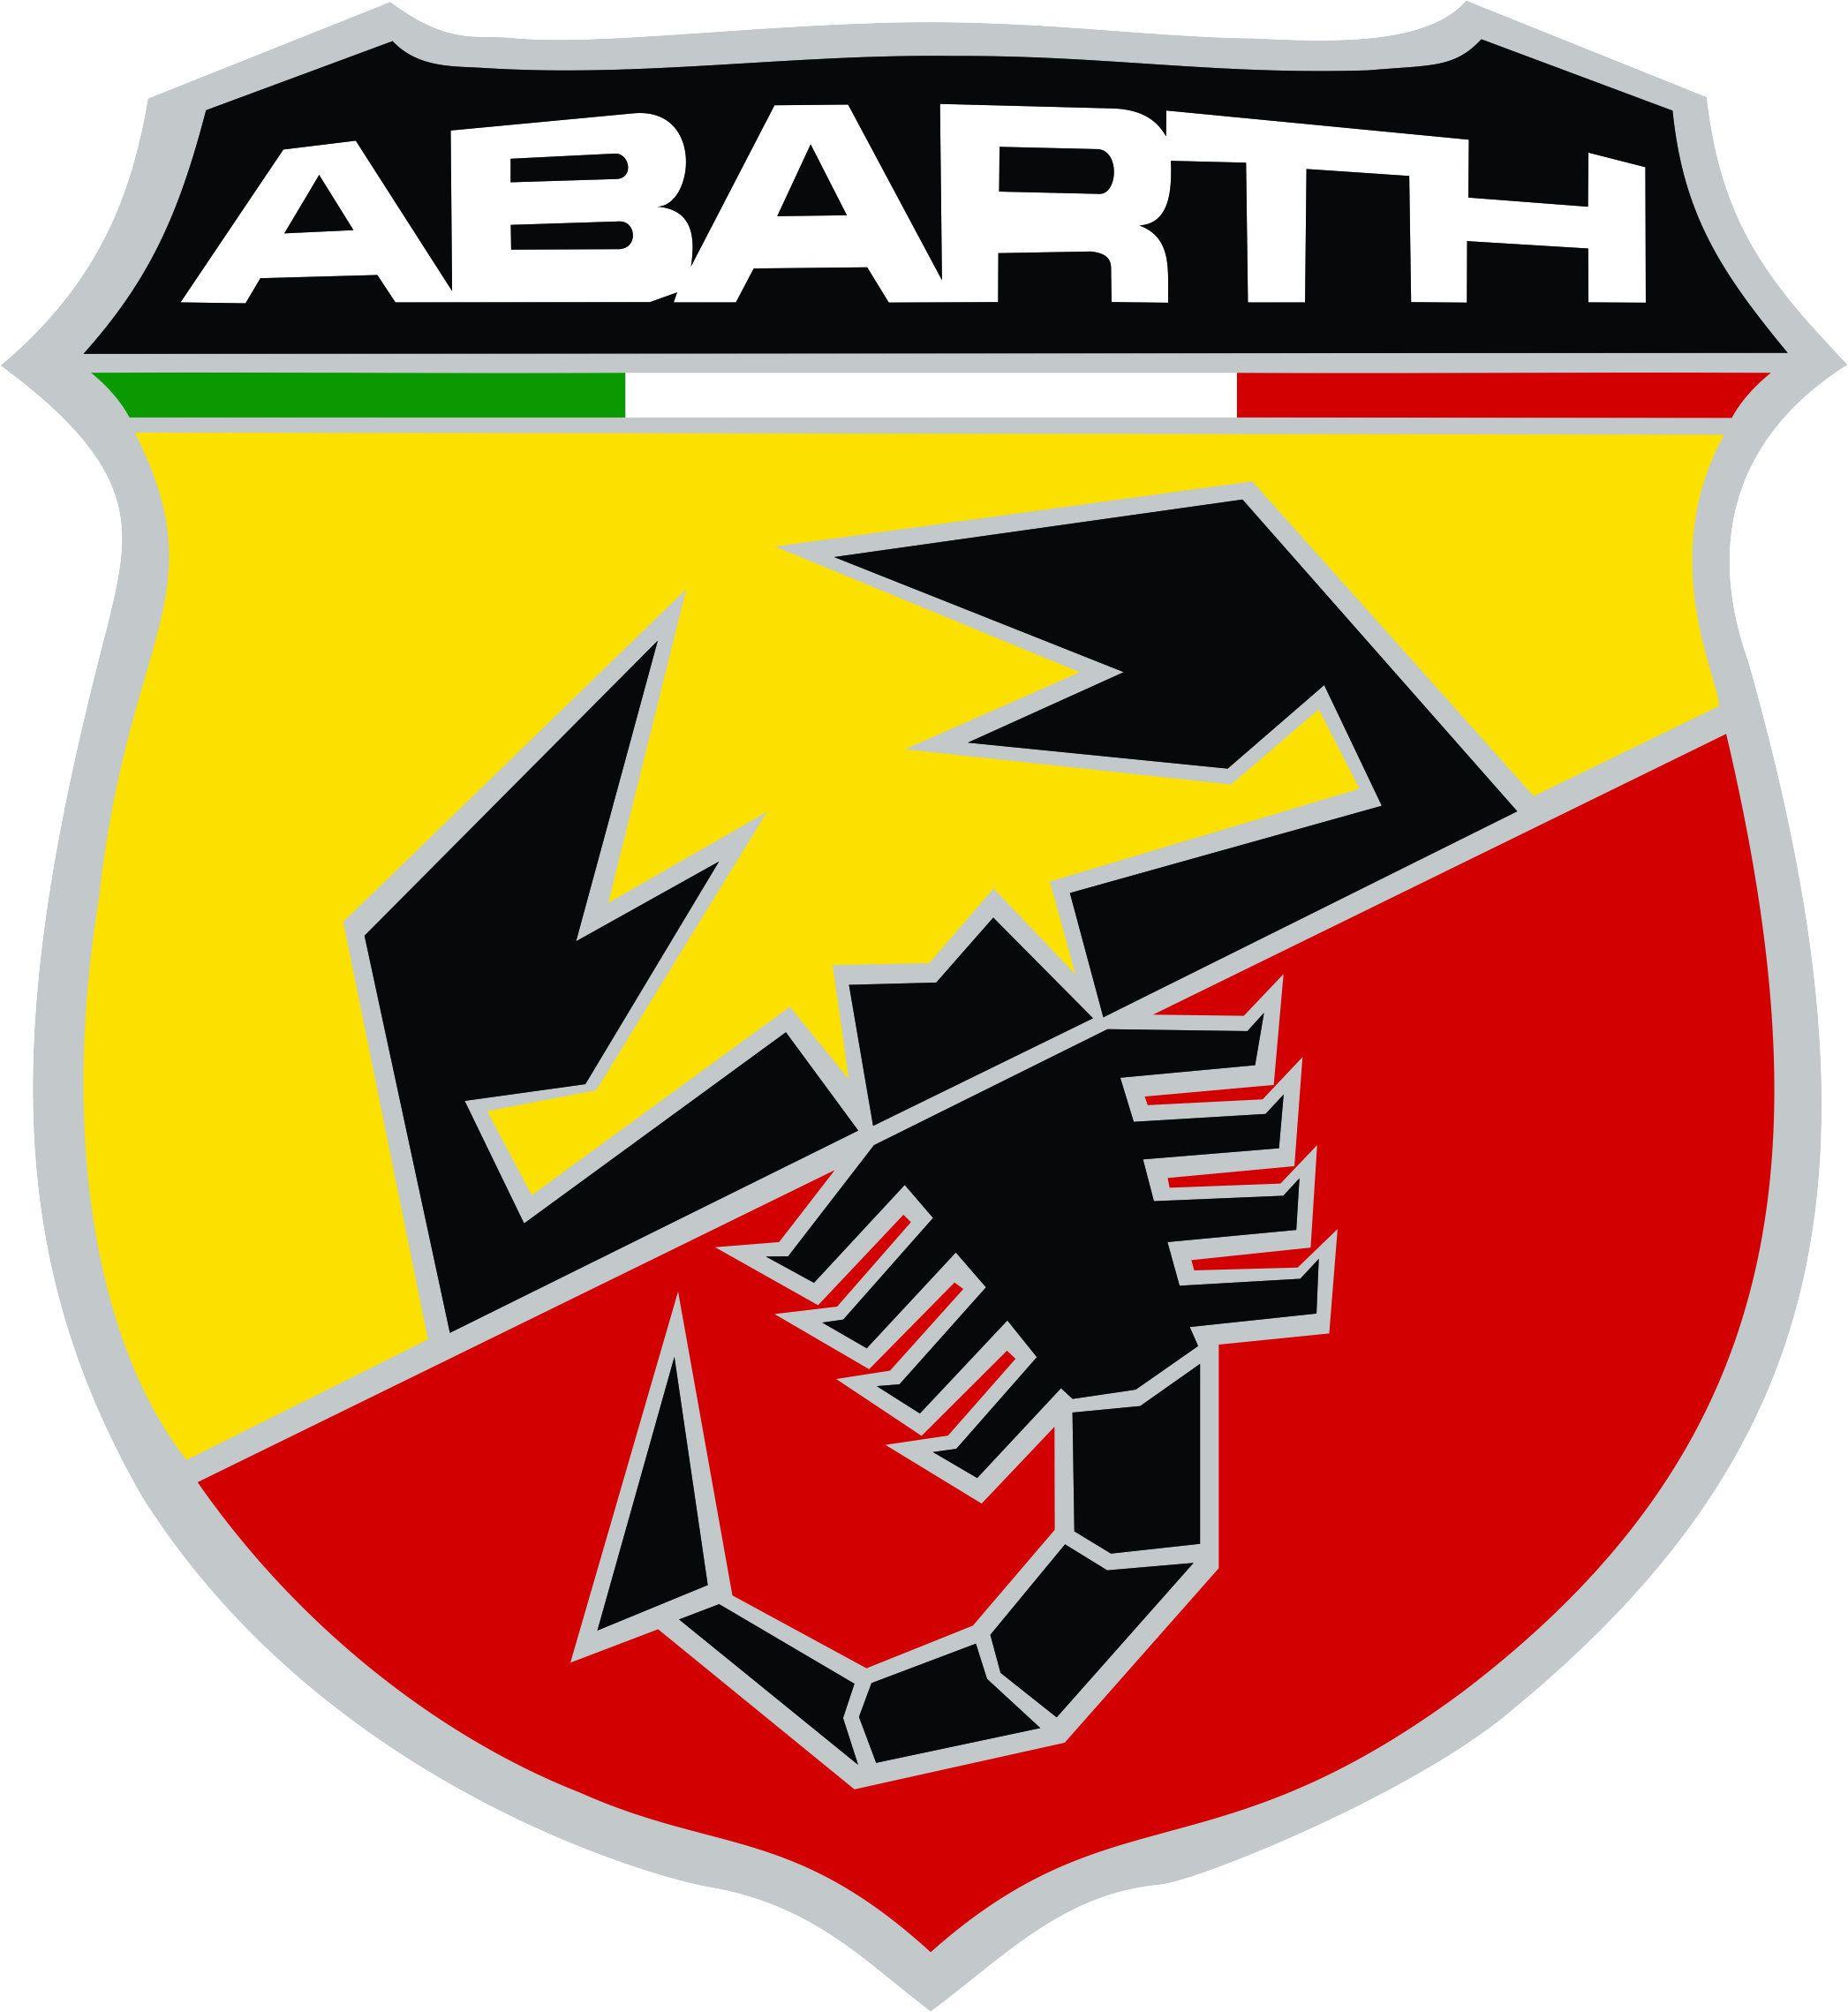 Abarth Logo Svg Jpeg By Svgcollage On Etsy Fiat Logo Car Logos Fiat Abarth